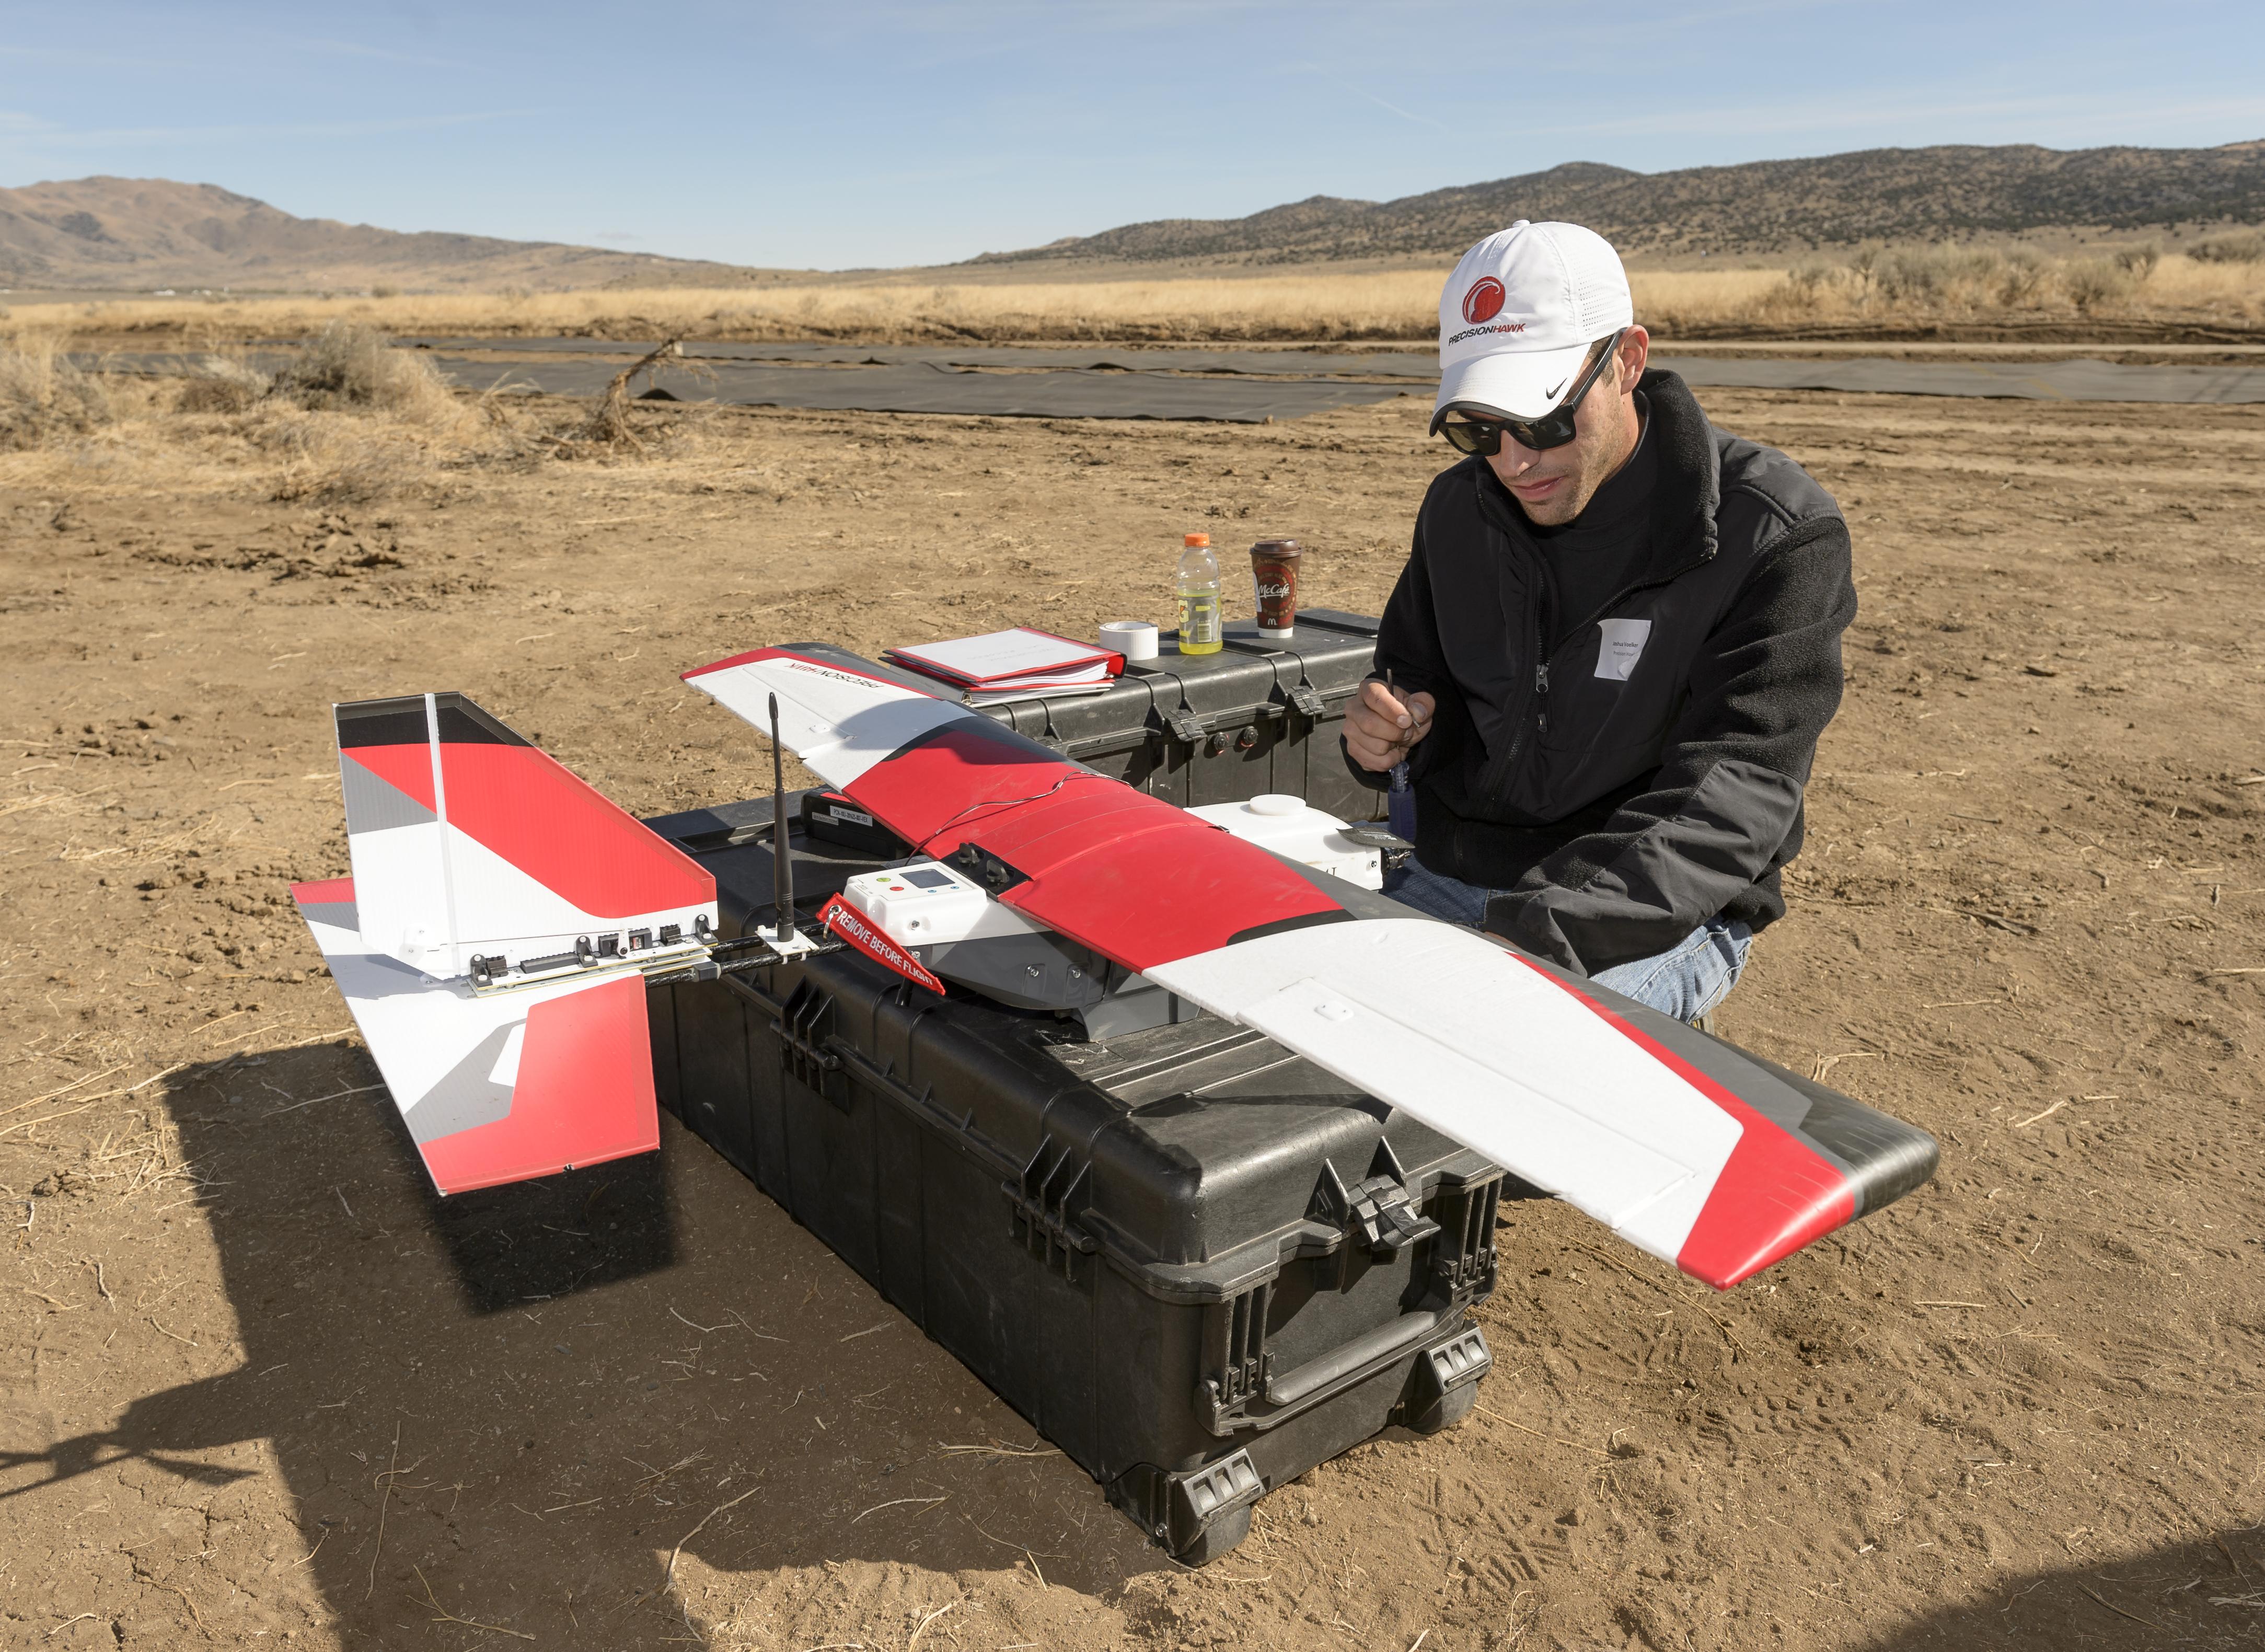 Pilot Nealing Near Drone Airplane Ready For Test Flight